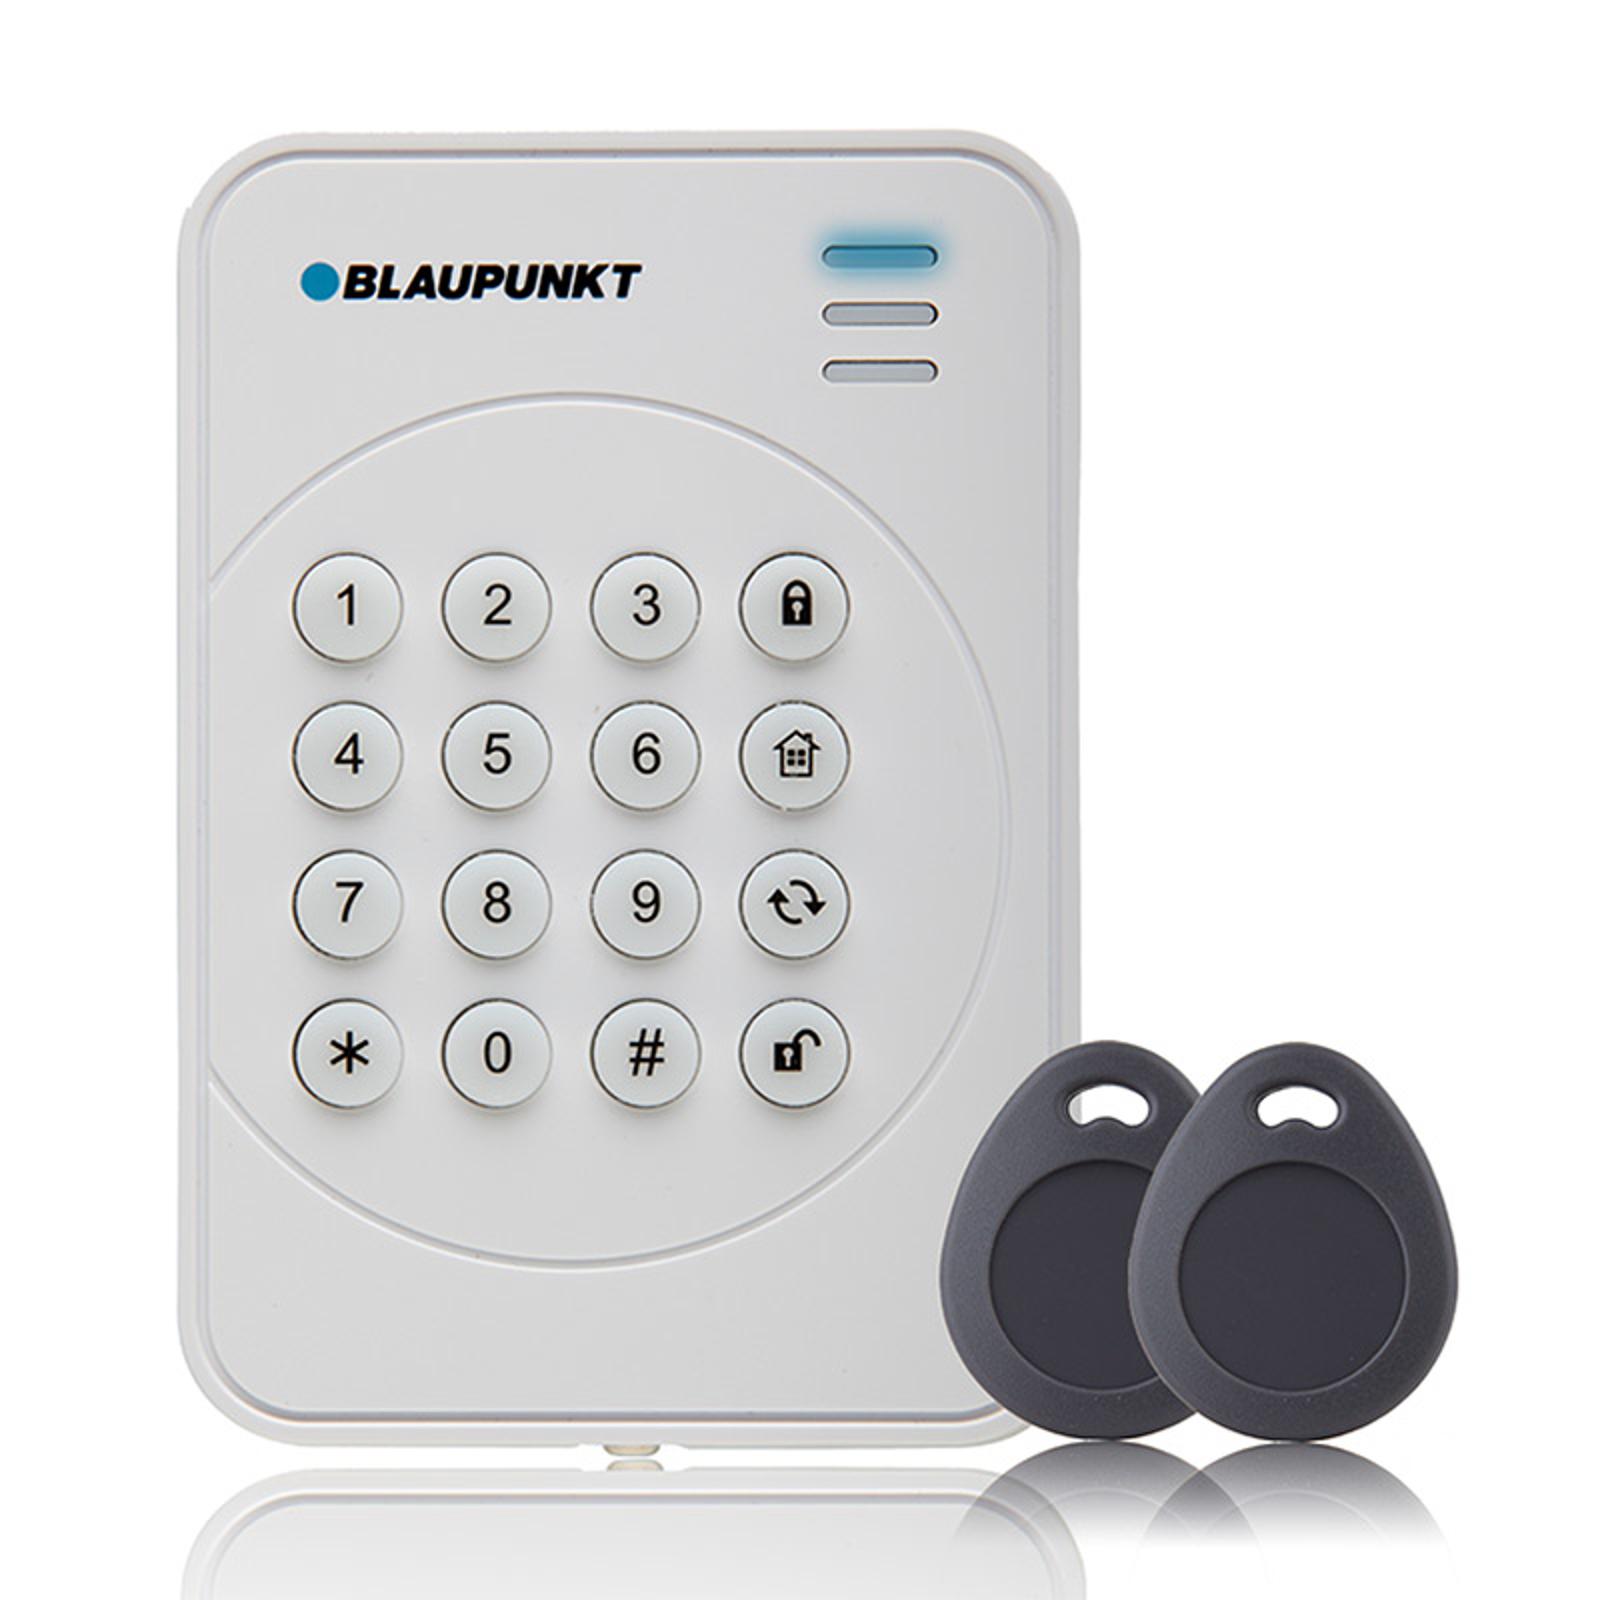 Blaupunkt KPT-R1 commande radio 2 étiquettes RFID